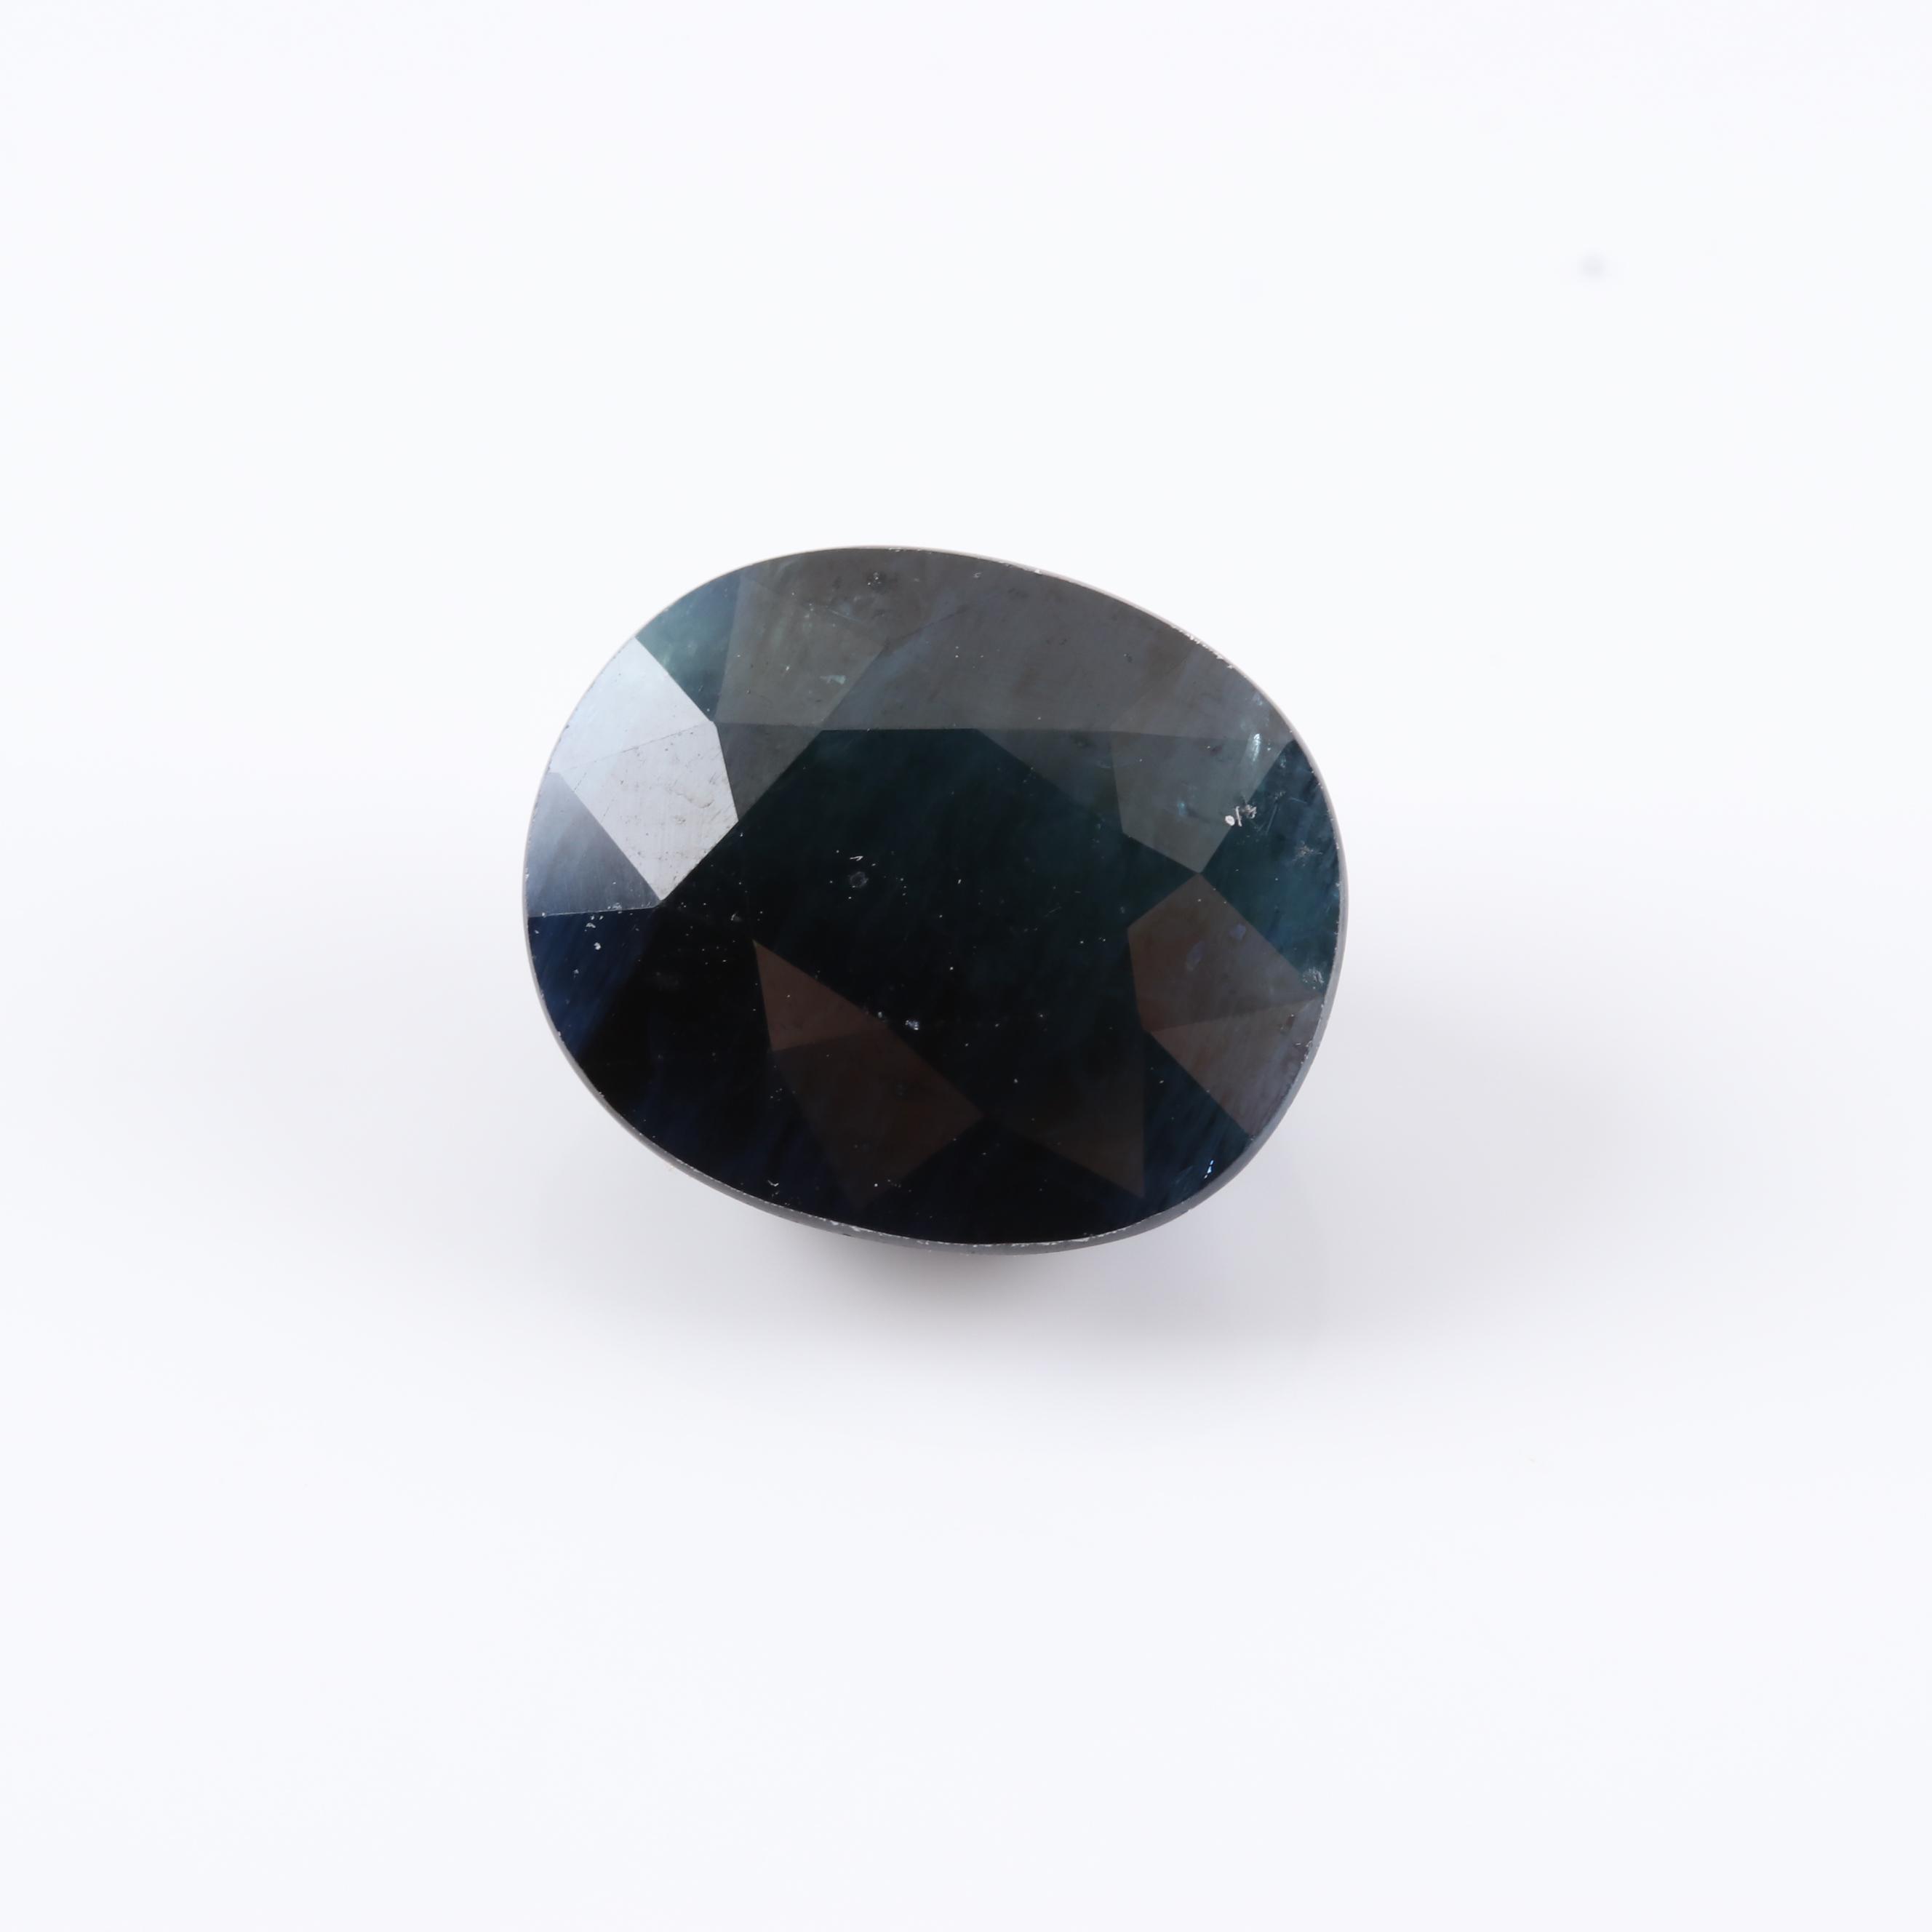 Loose 8.94 CT Sapphire Gemstone